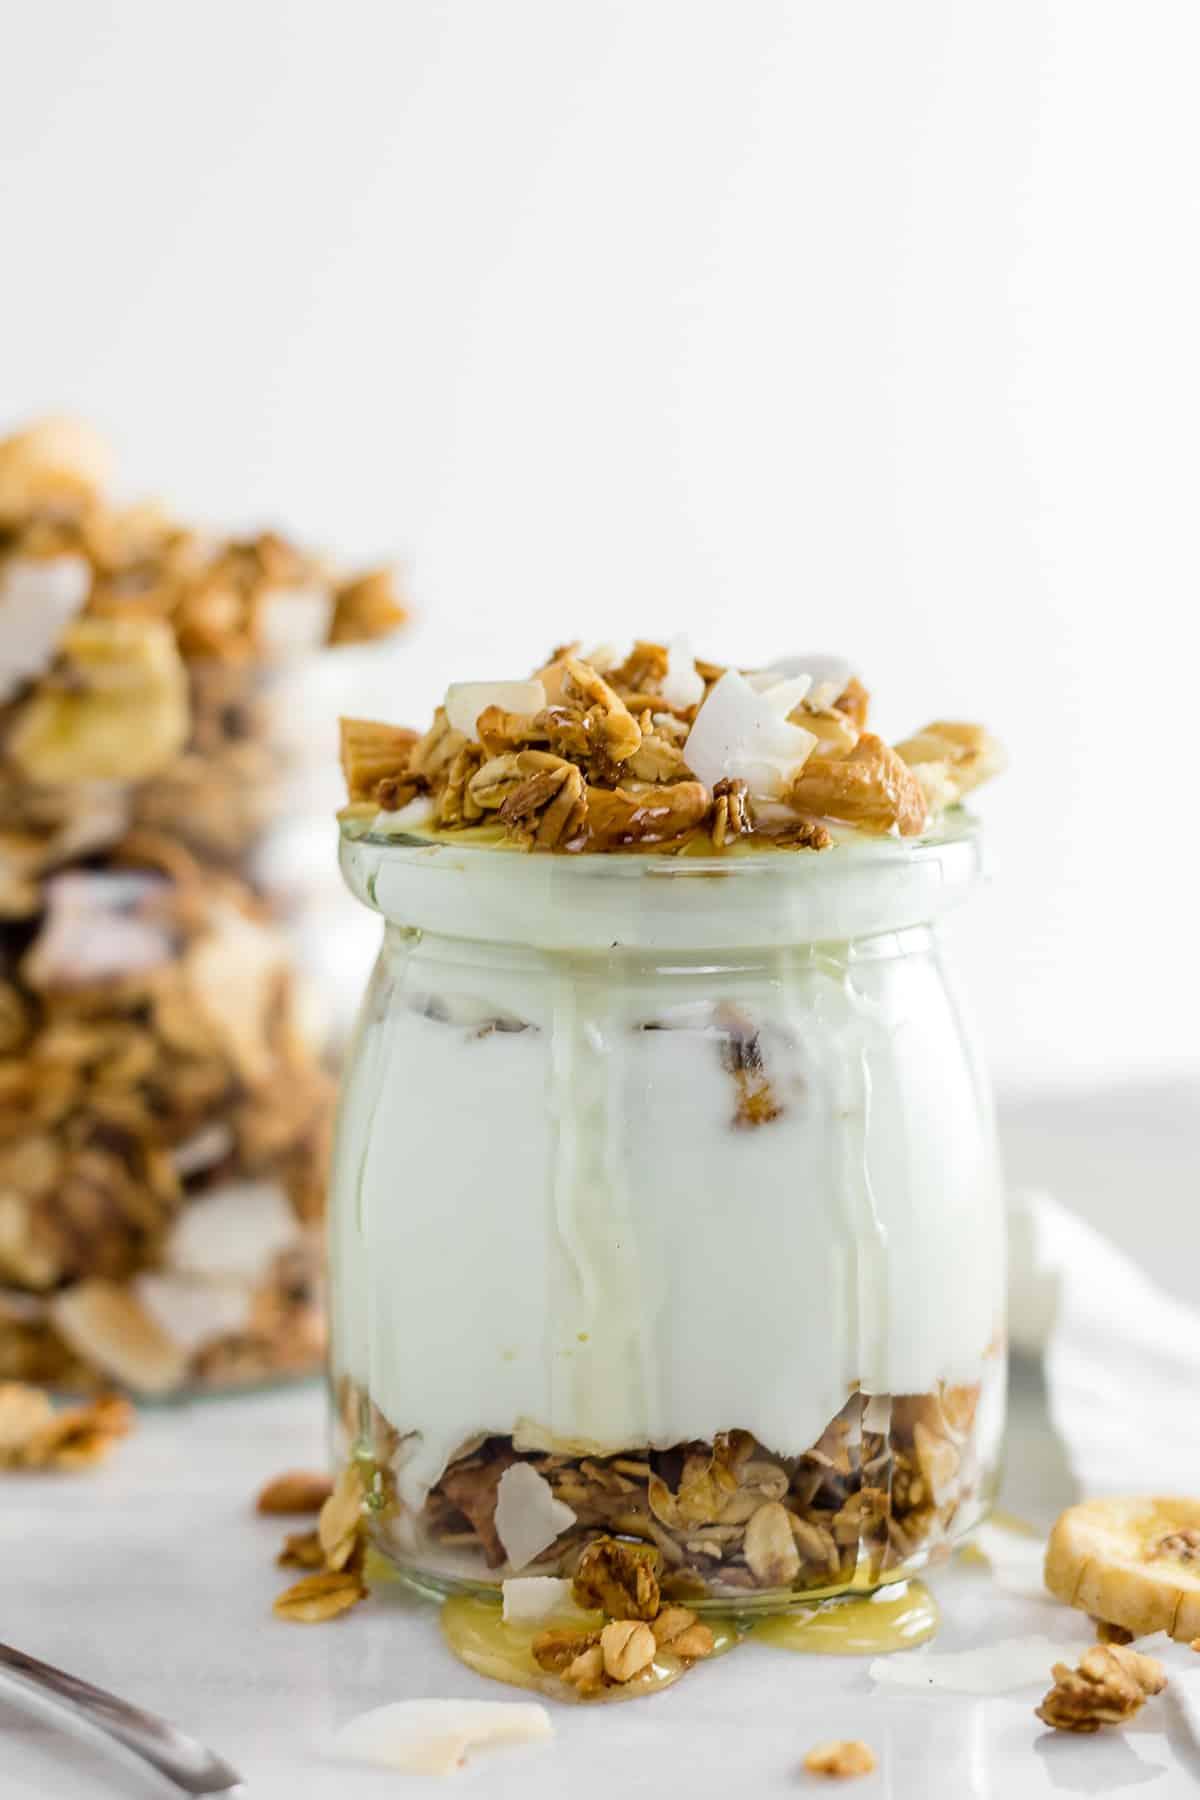 Healthy Banana Coconut Cashew Granola (gluten free + vegan)